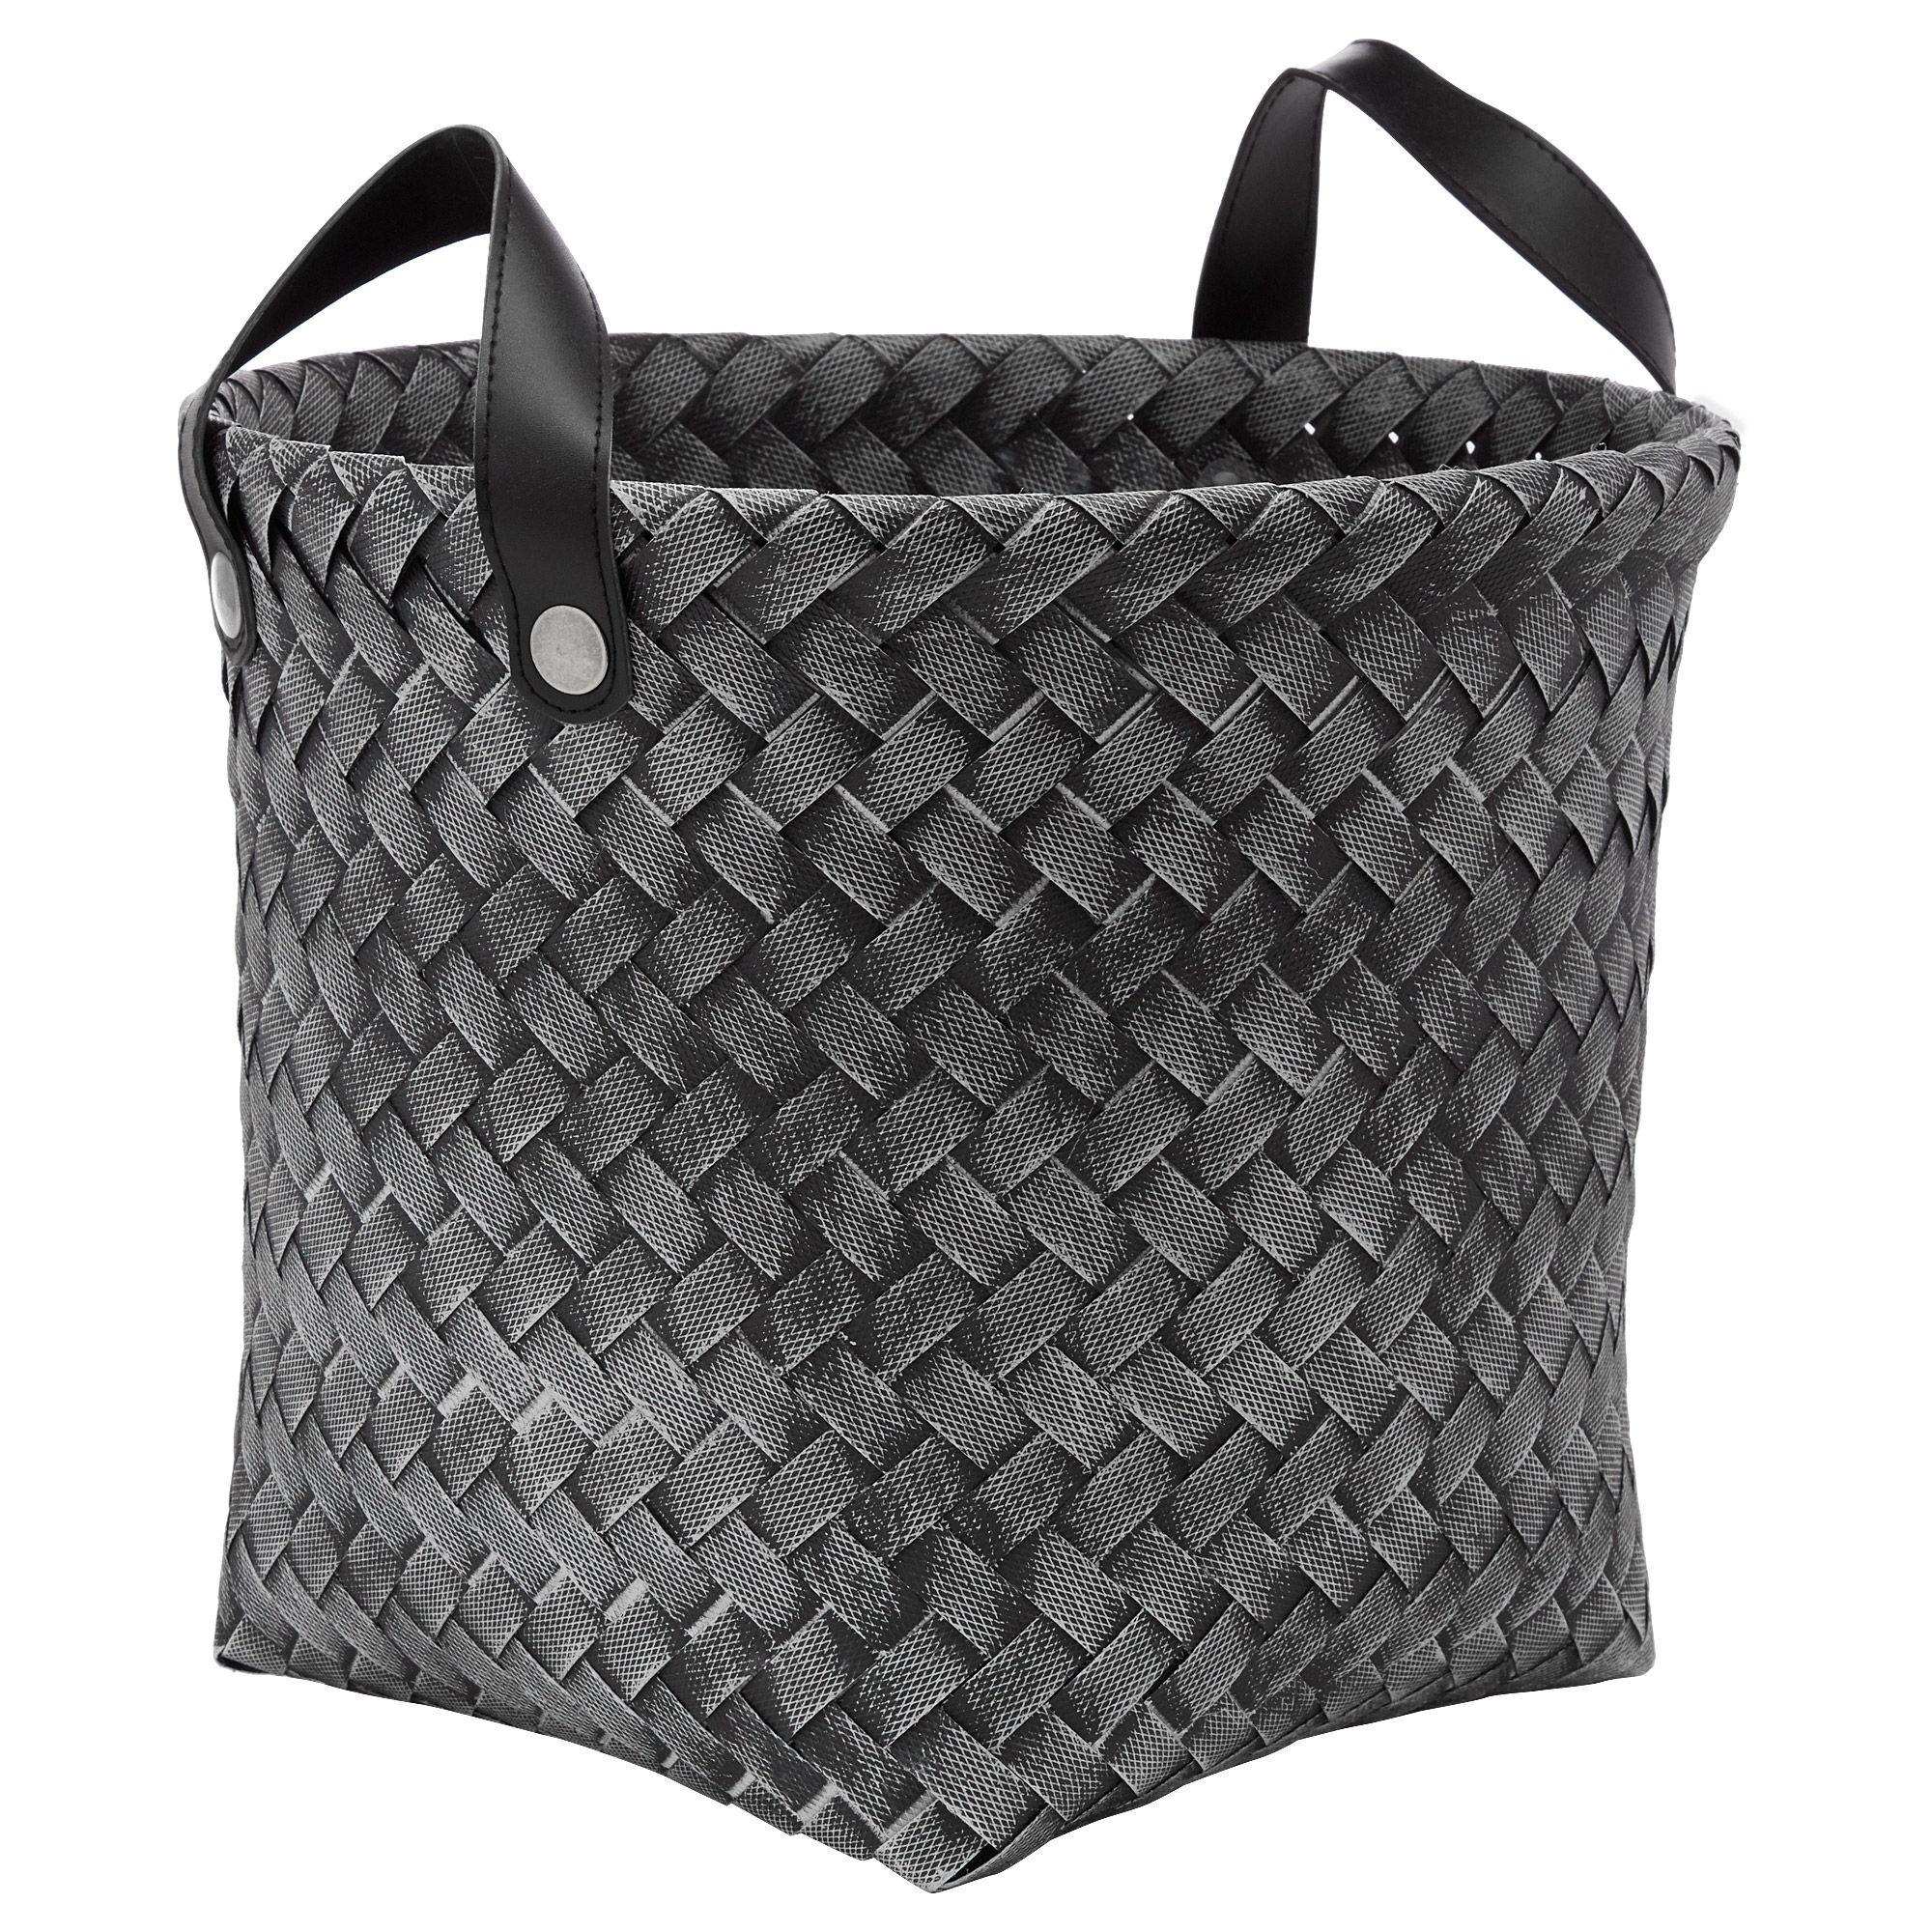 Medium Woven Plastic Storage Basket